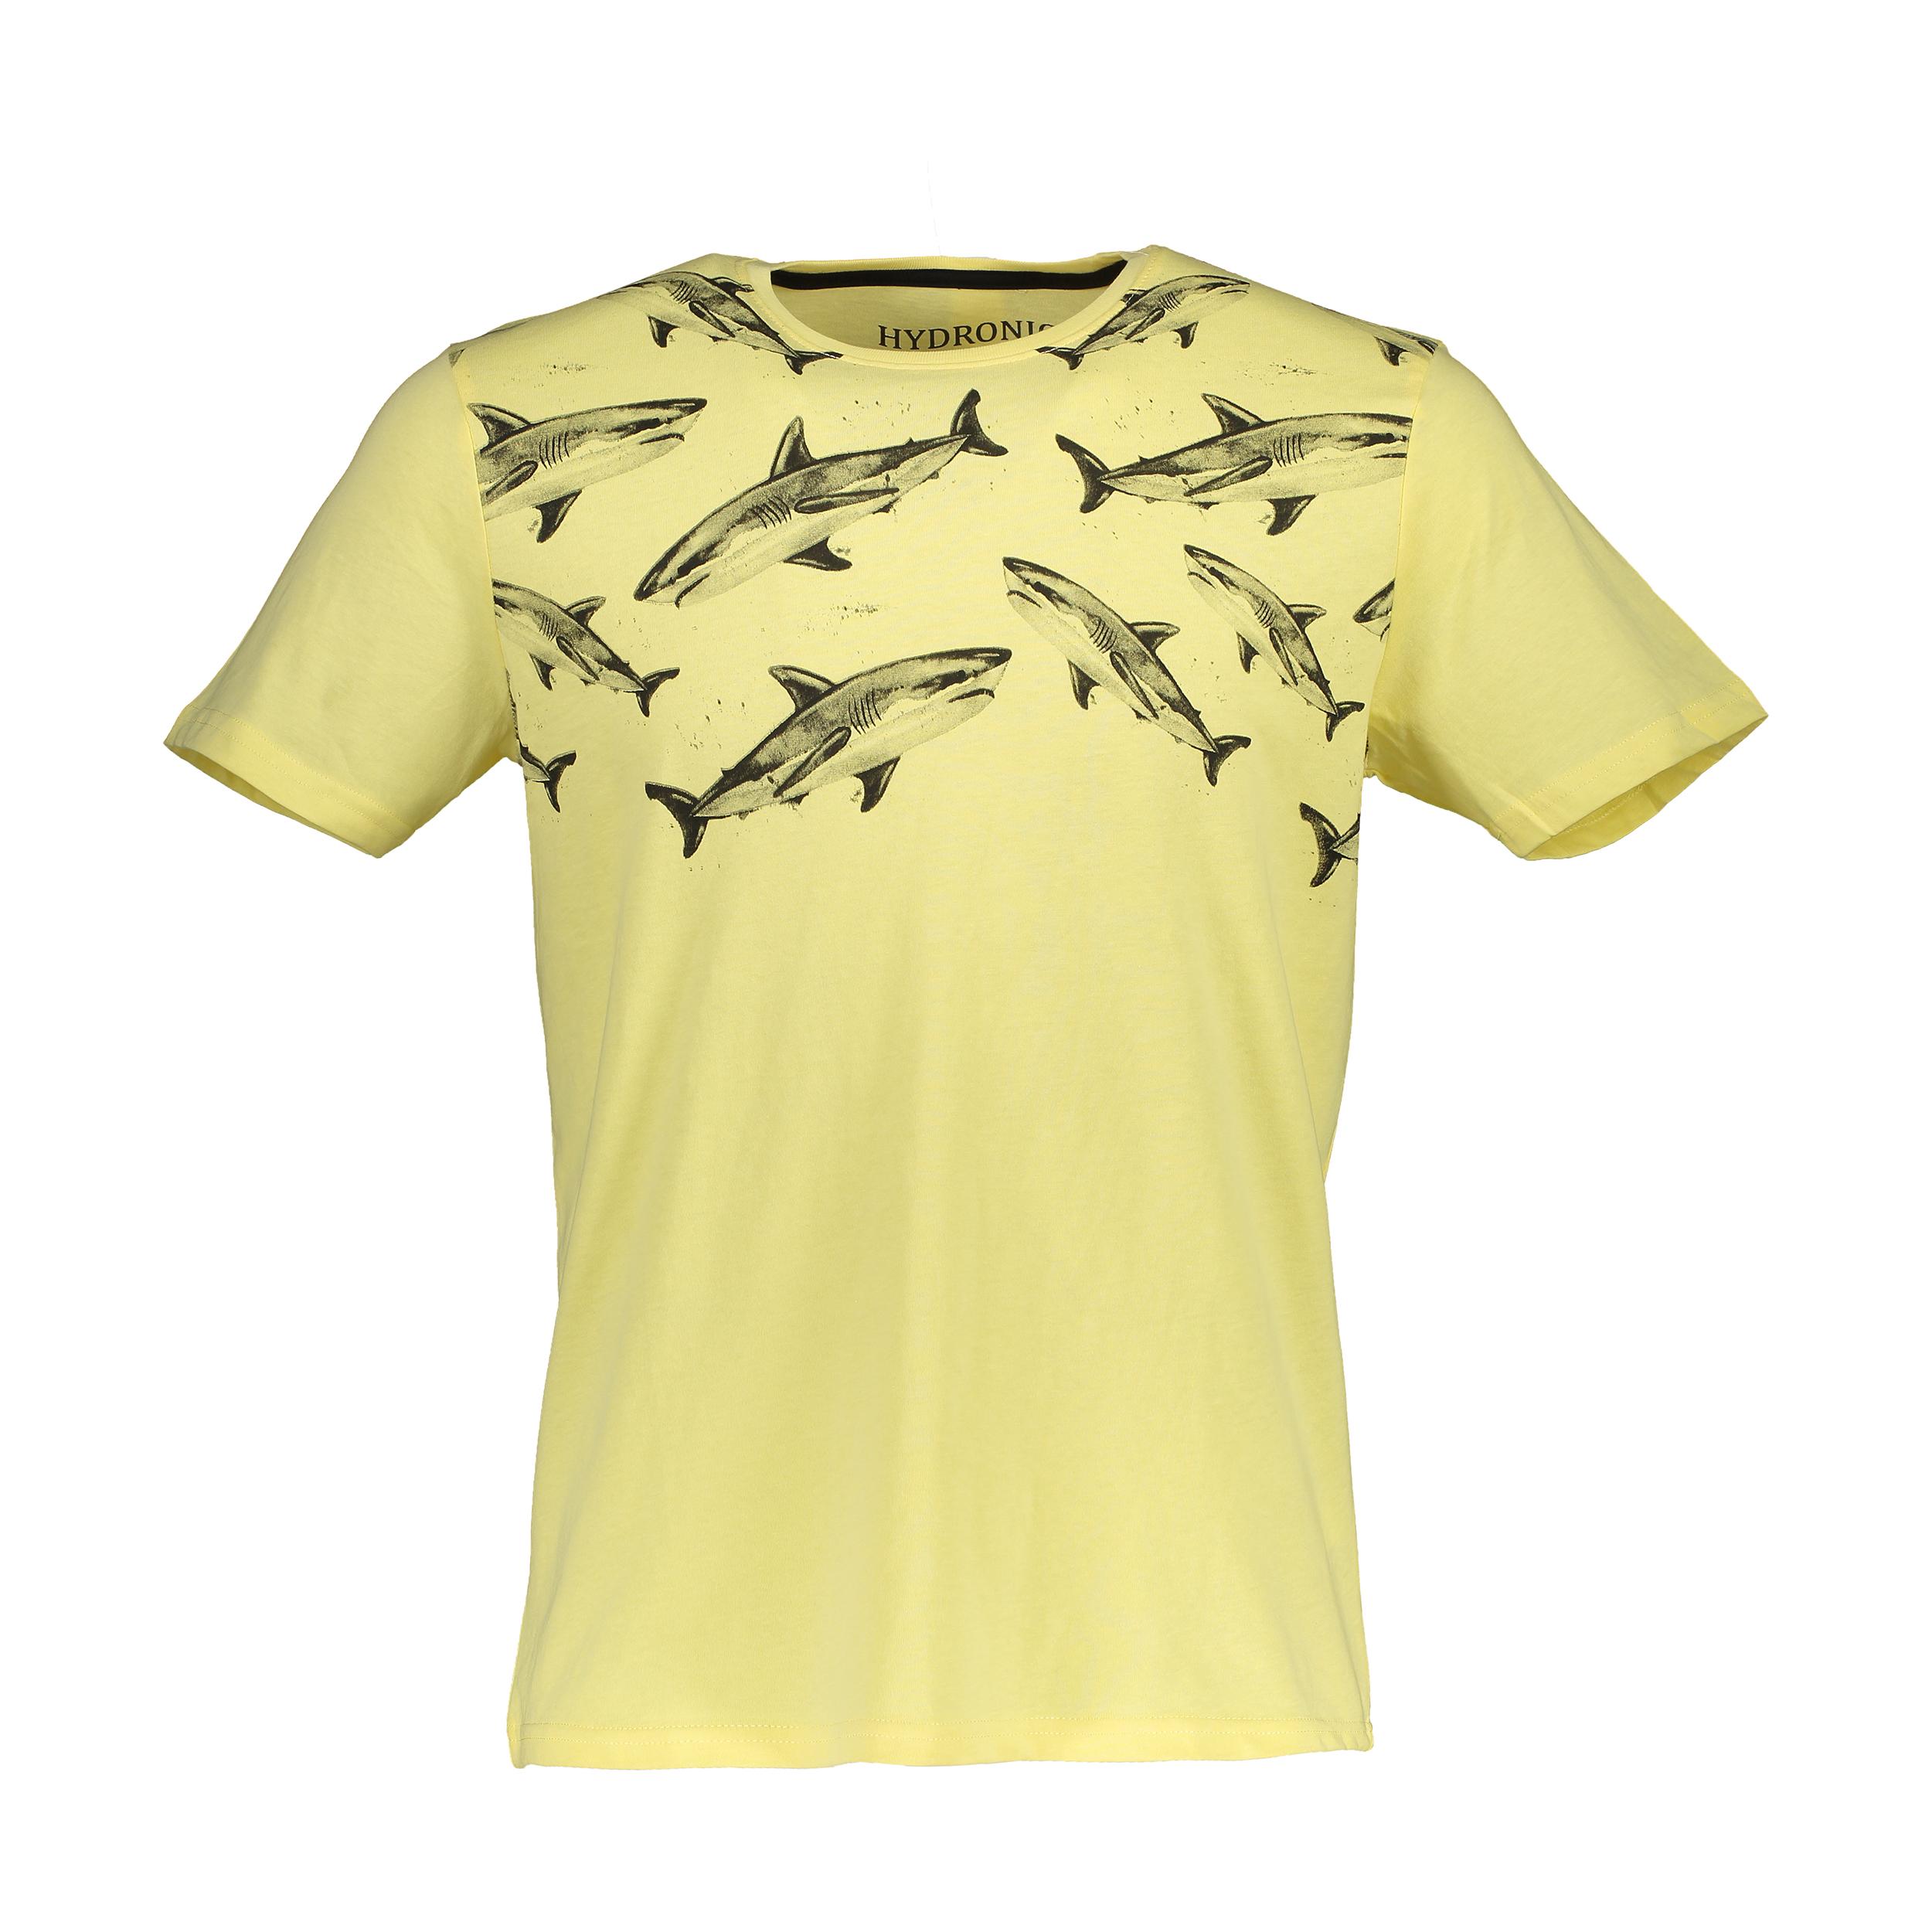 تی شرت نخی پسرانه - یوپیم